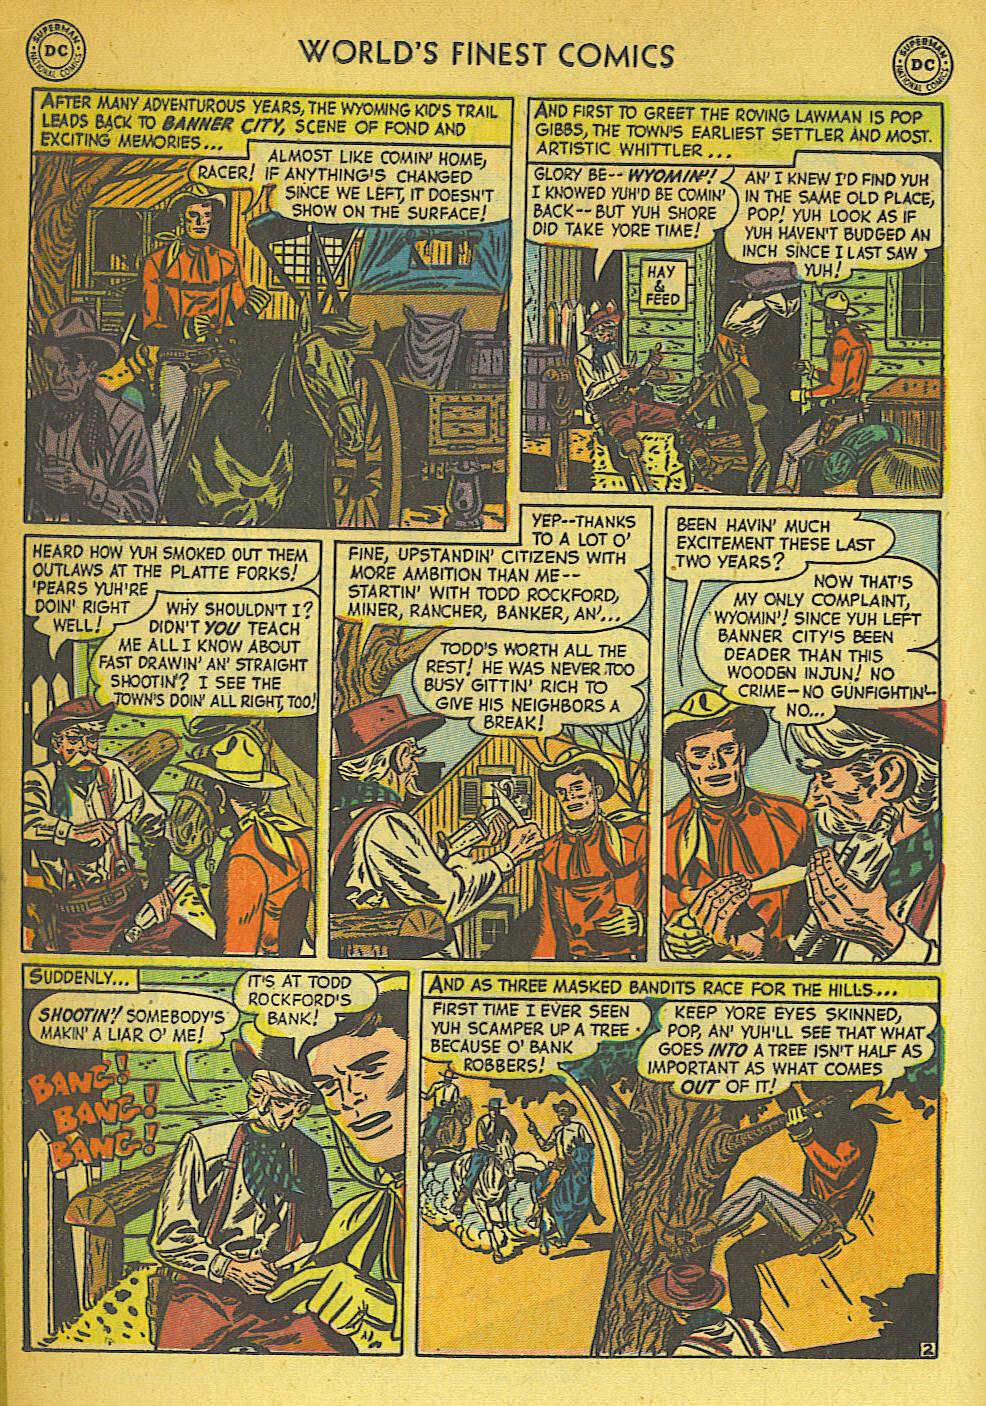 Read online World's Finest Comics comic -  Issue #57 - 30